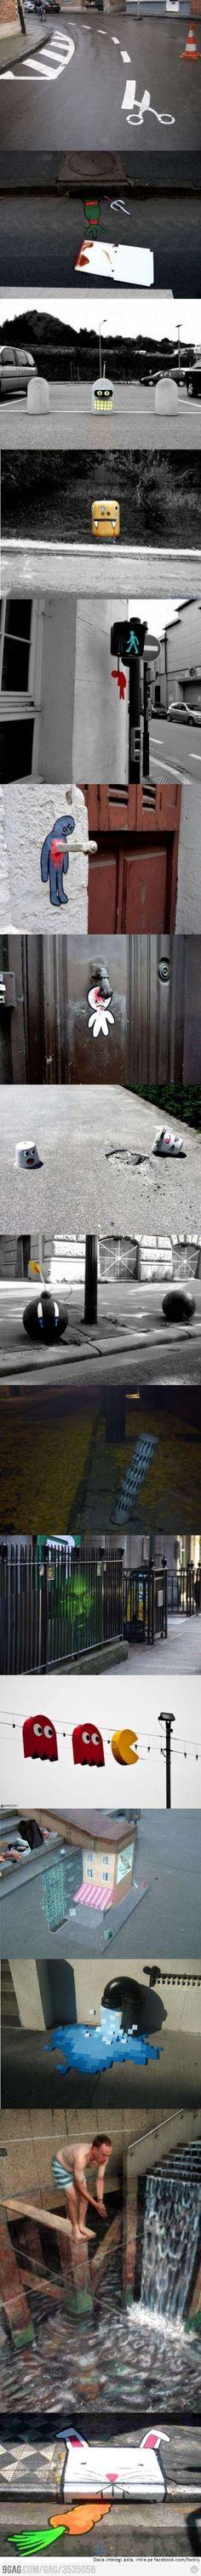 Funny street art: la tartaruga ninja è la migliore!